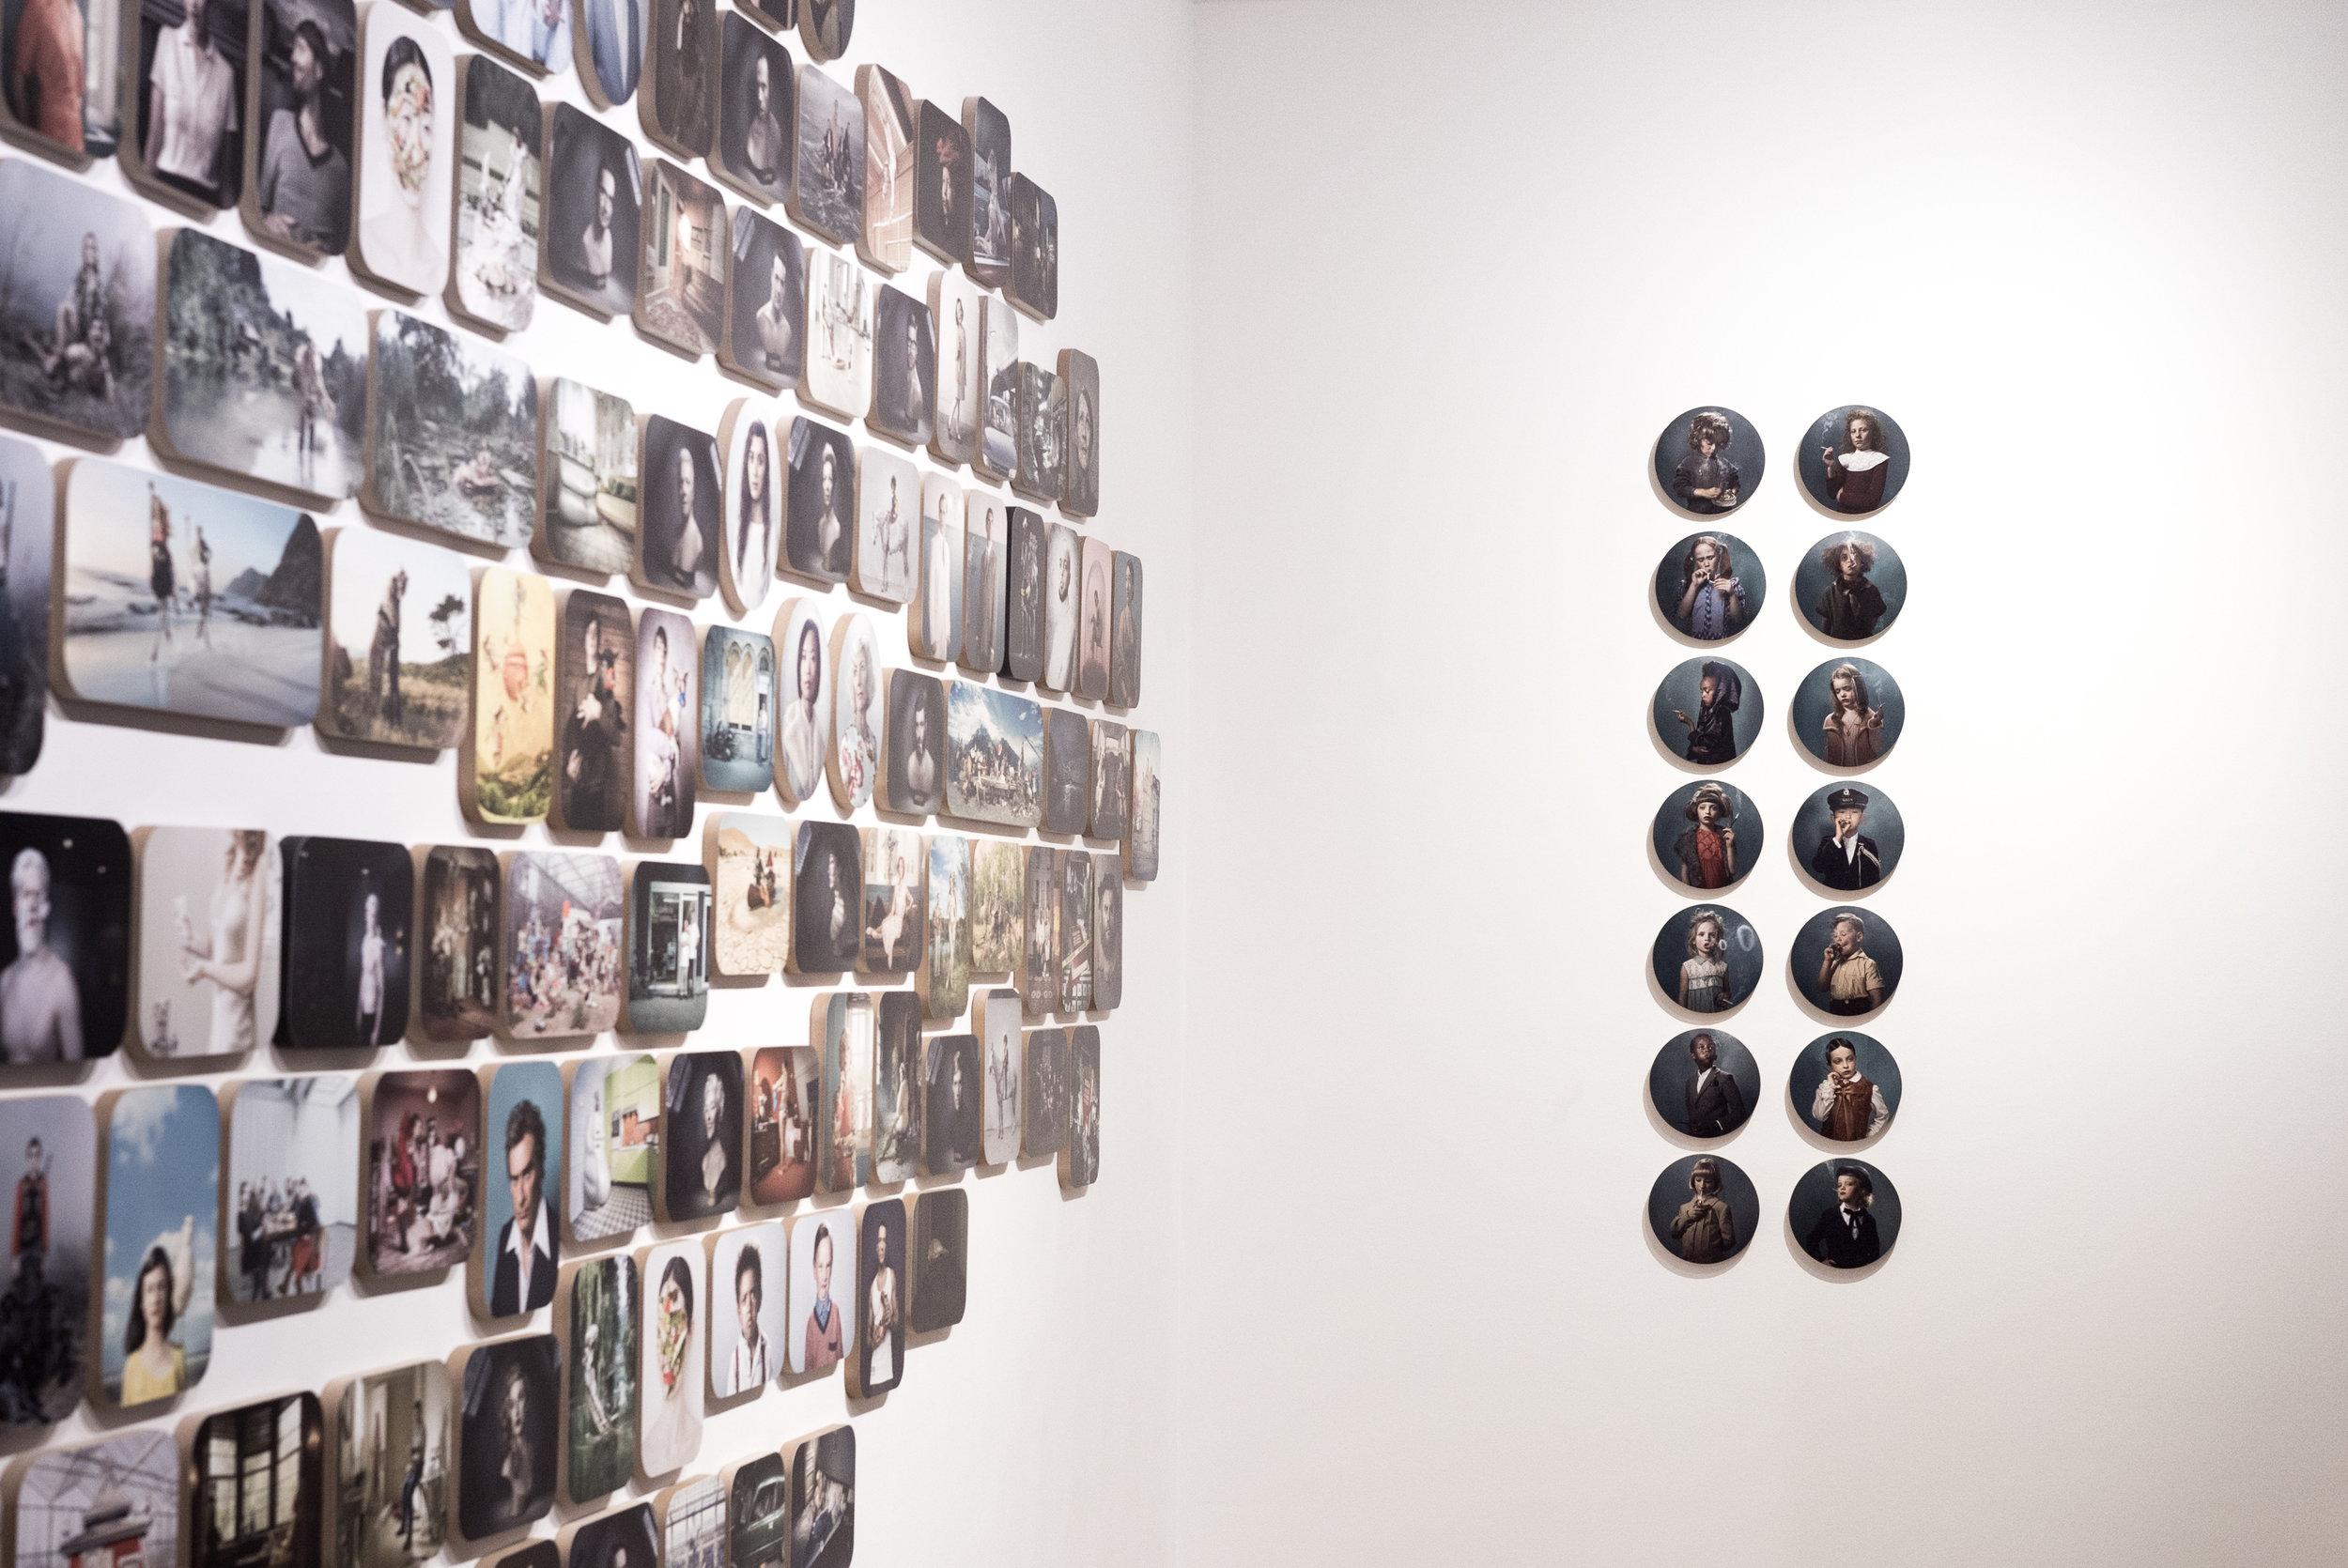 Set design Gallery Ingrid Deuss